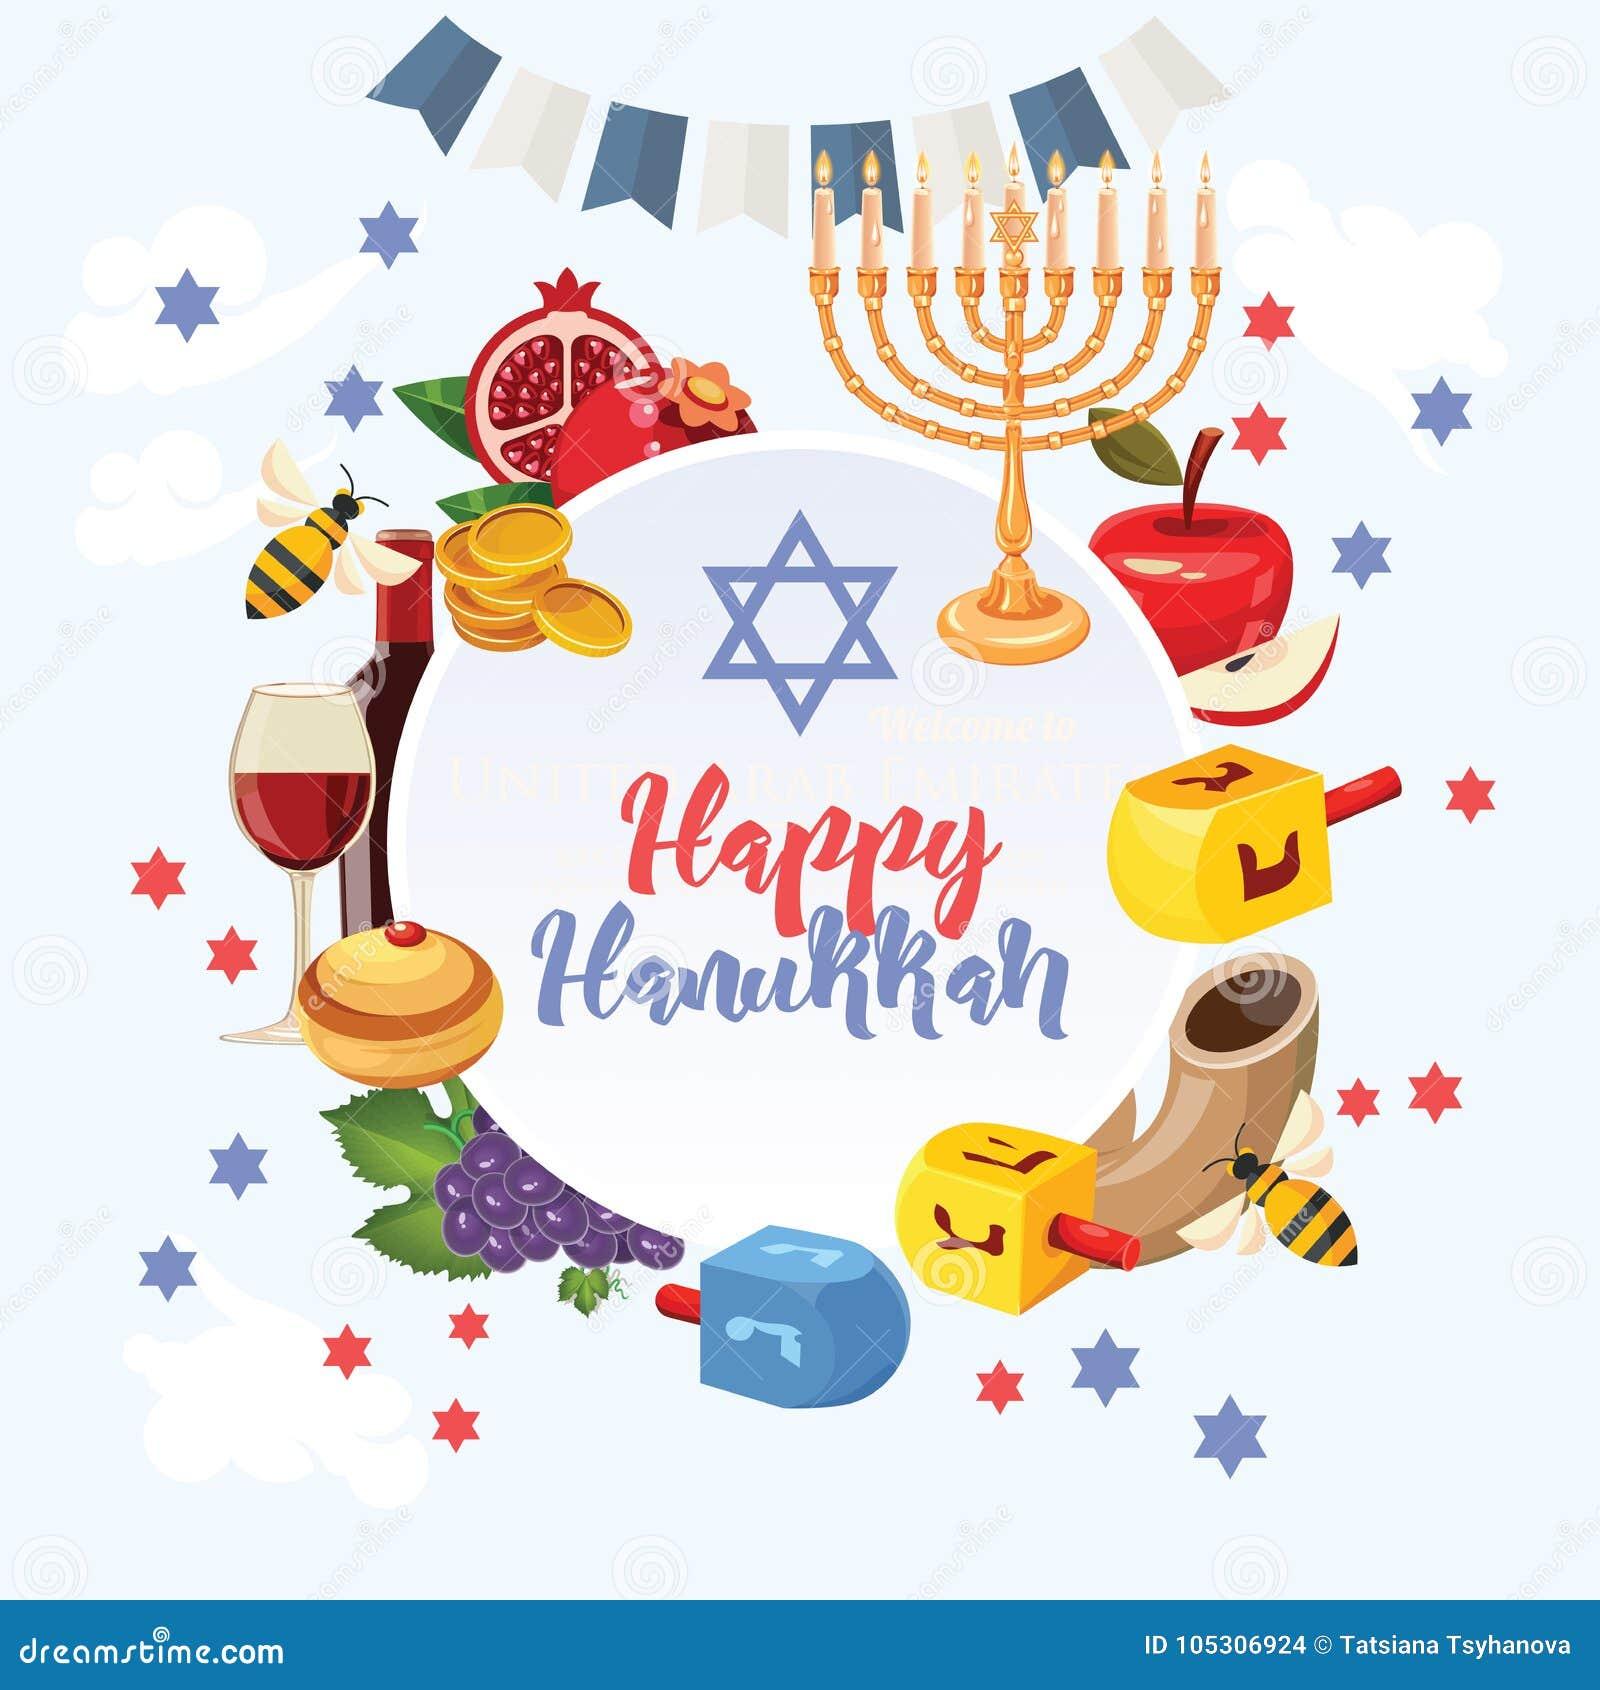 Happy hanukkah vector greeting card with davids star and menorah in download happy hanukkah vector greeting card with davids star and menorah in modern style m4hsunfo